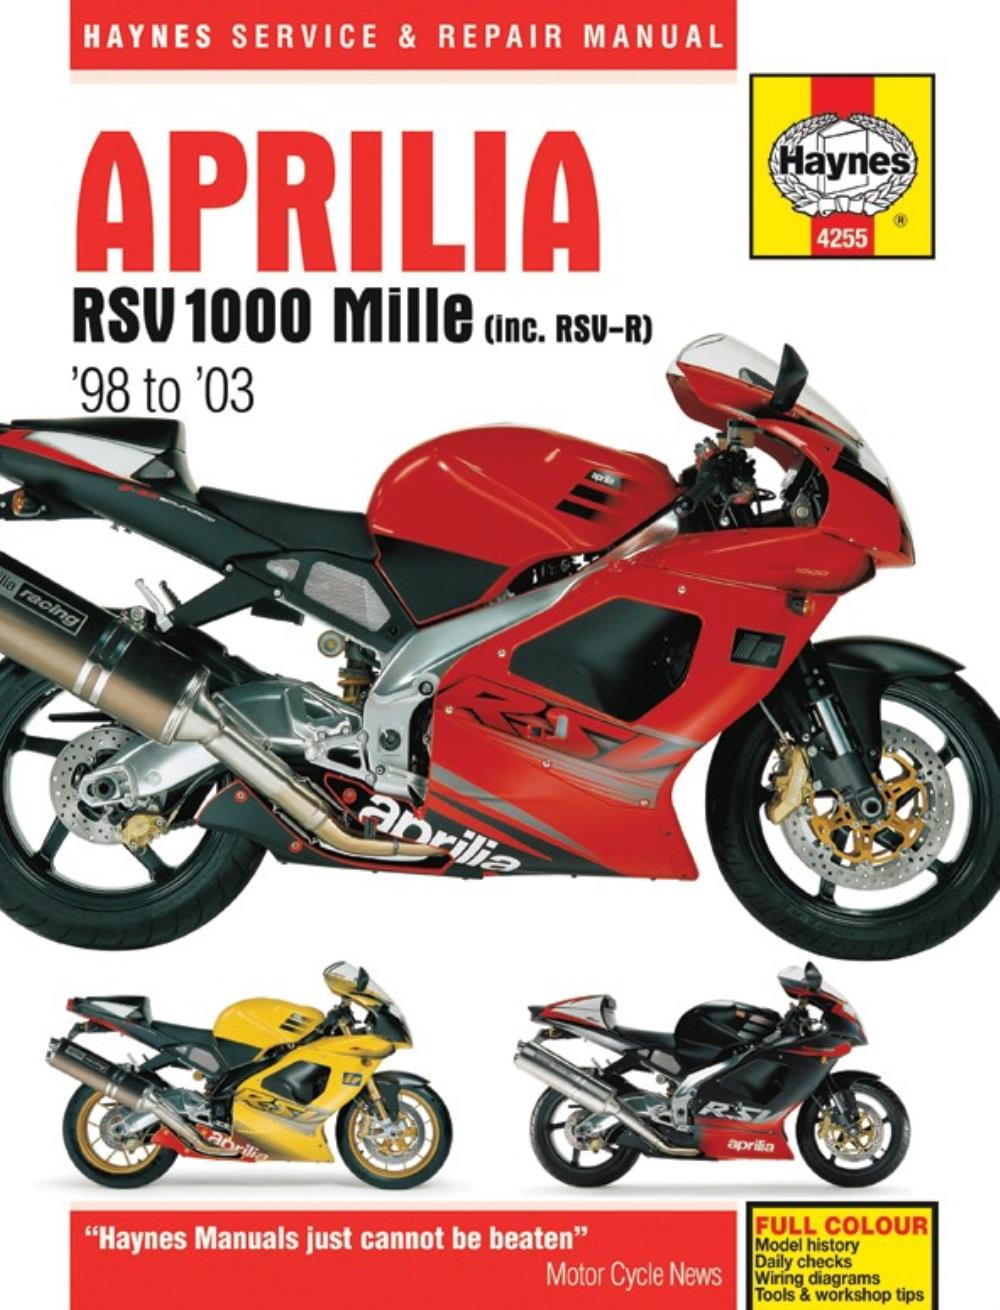 medium resolution of image is loading manual haynes for 2002 aprilia rsv 1000